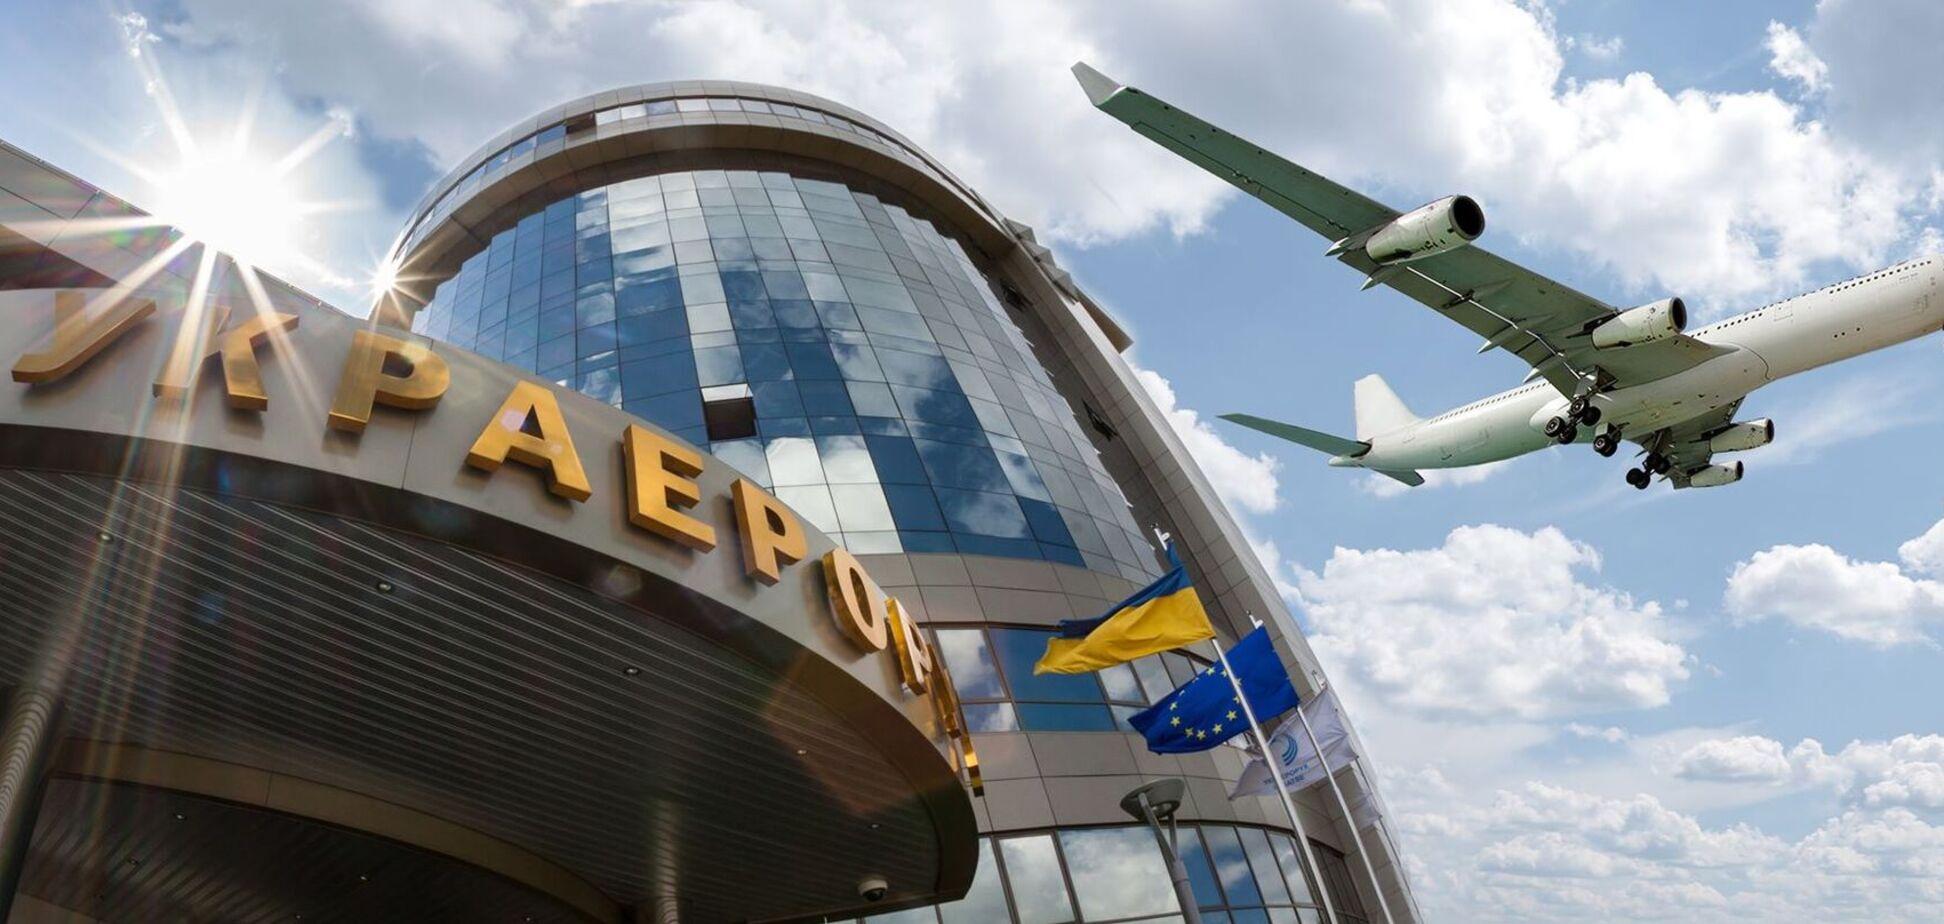 Заступника директора 'Украероруху' затримали через шахрайство на $100 тисяч